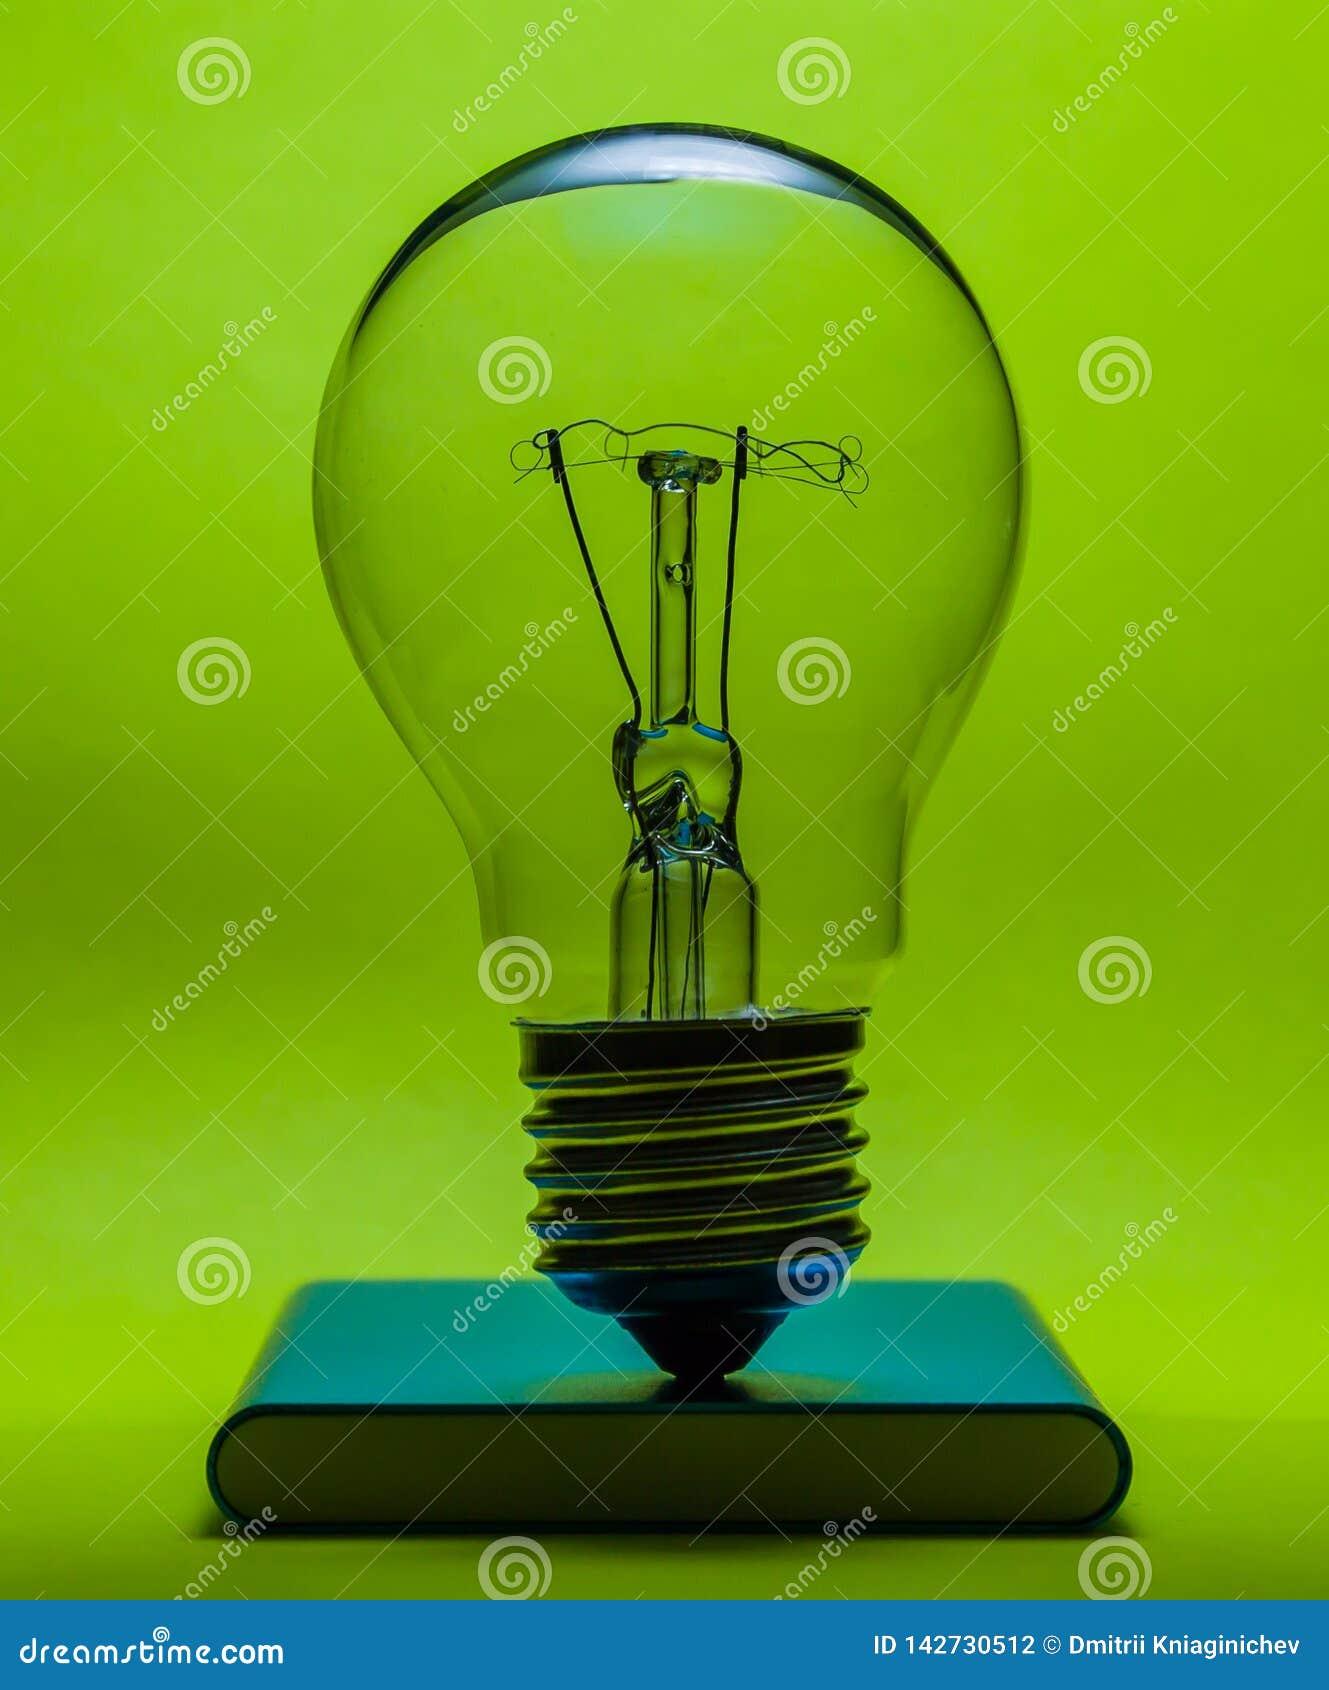 Light bulb on green background-image